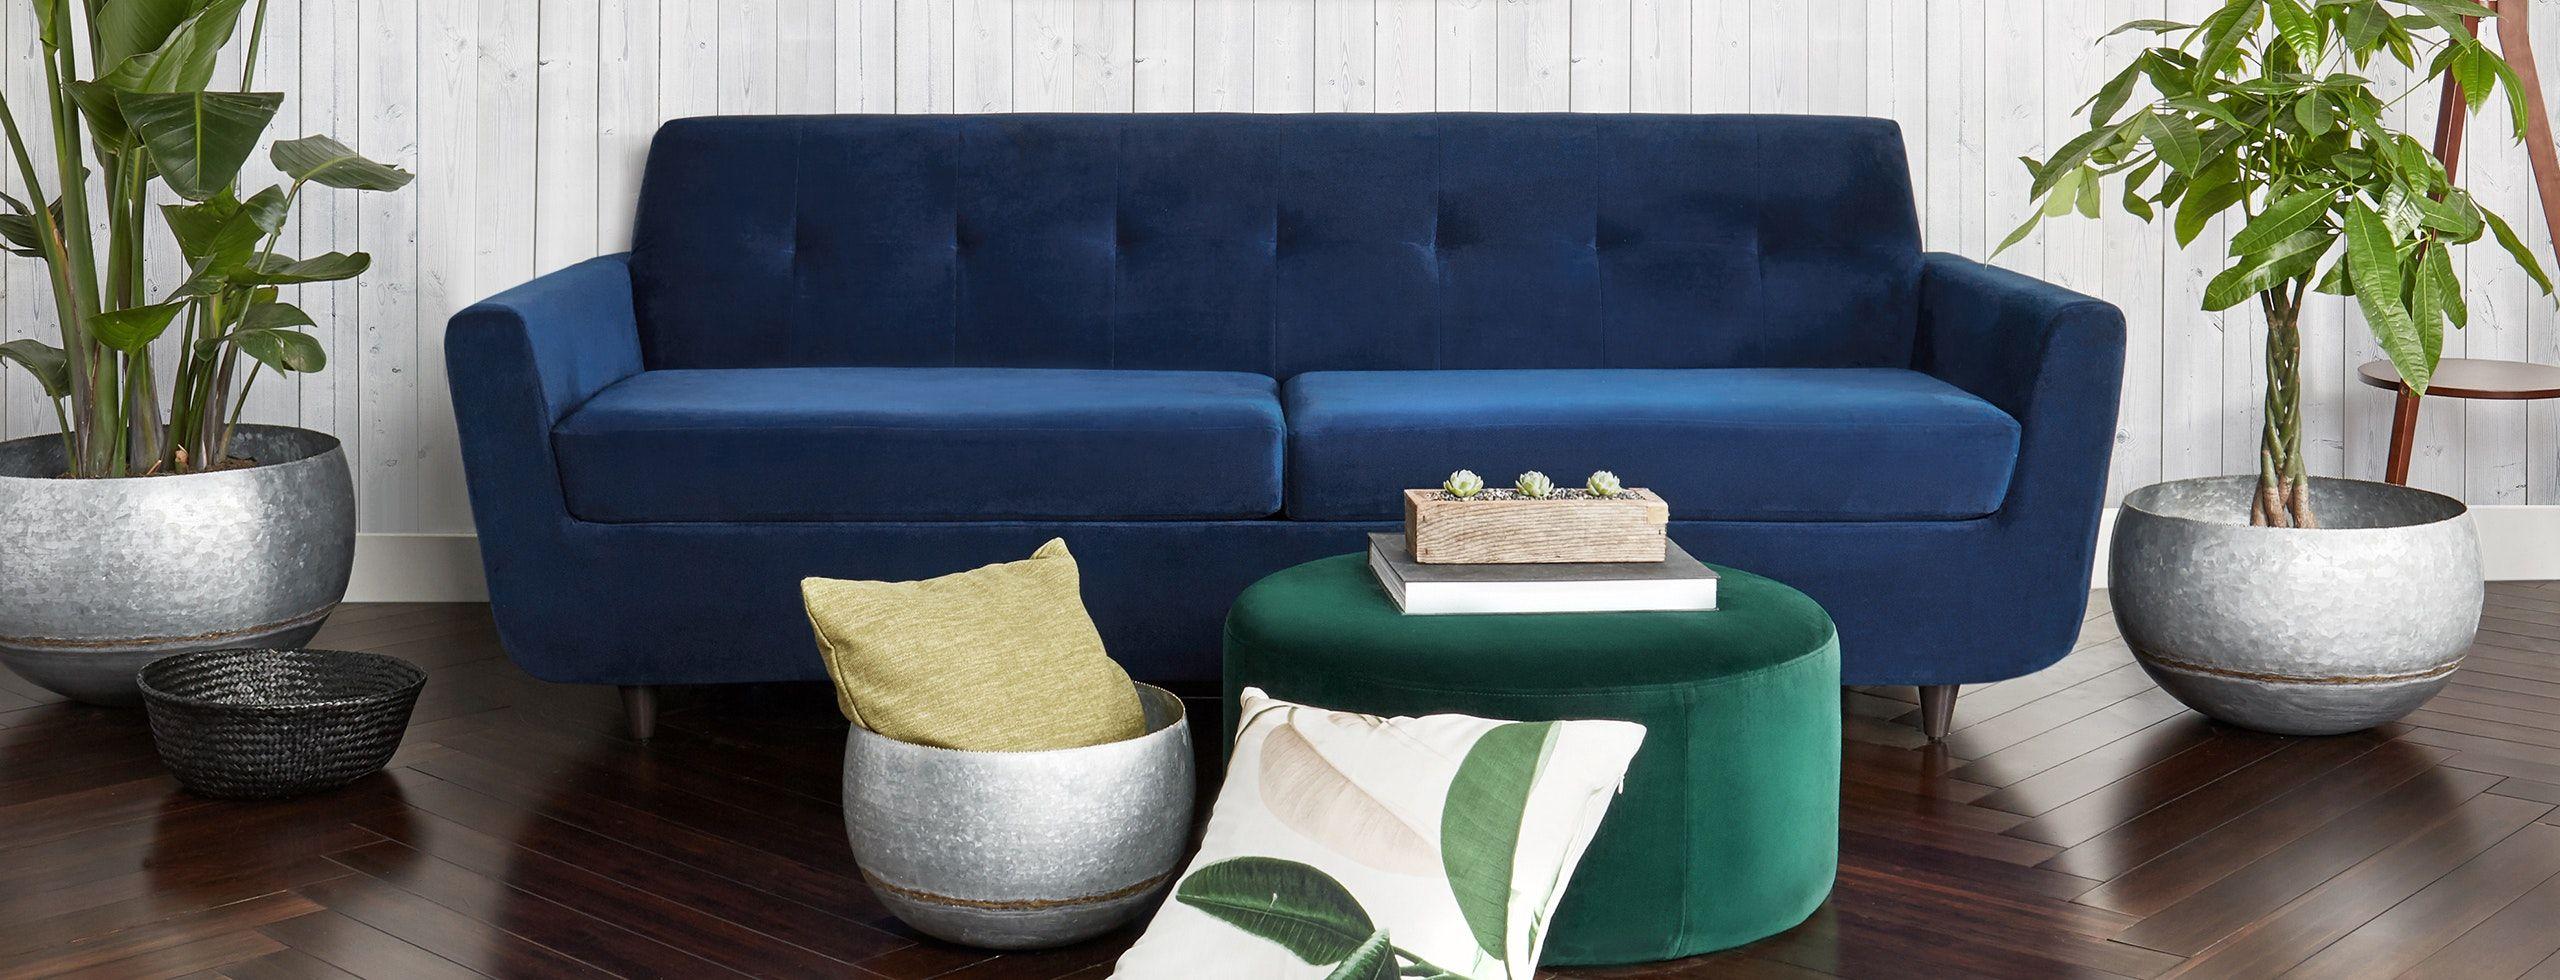 official photos 3f002 e1395 Hughes Sleeper Sofa   furniture - sit on it   Sleeper sofa ...